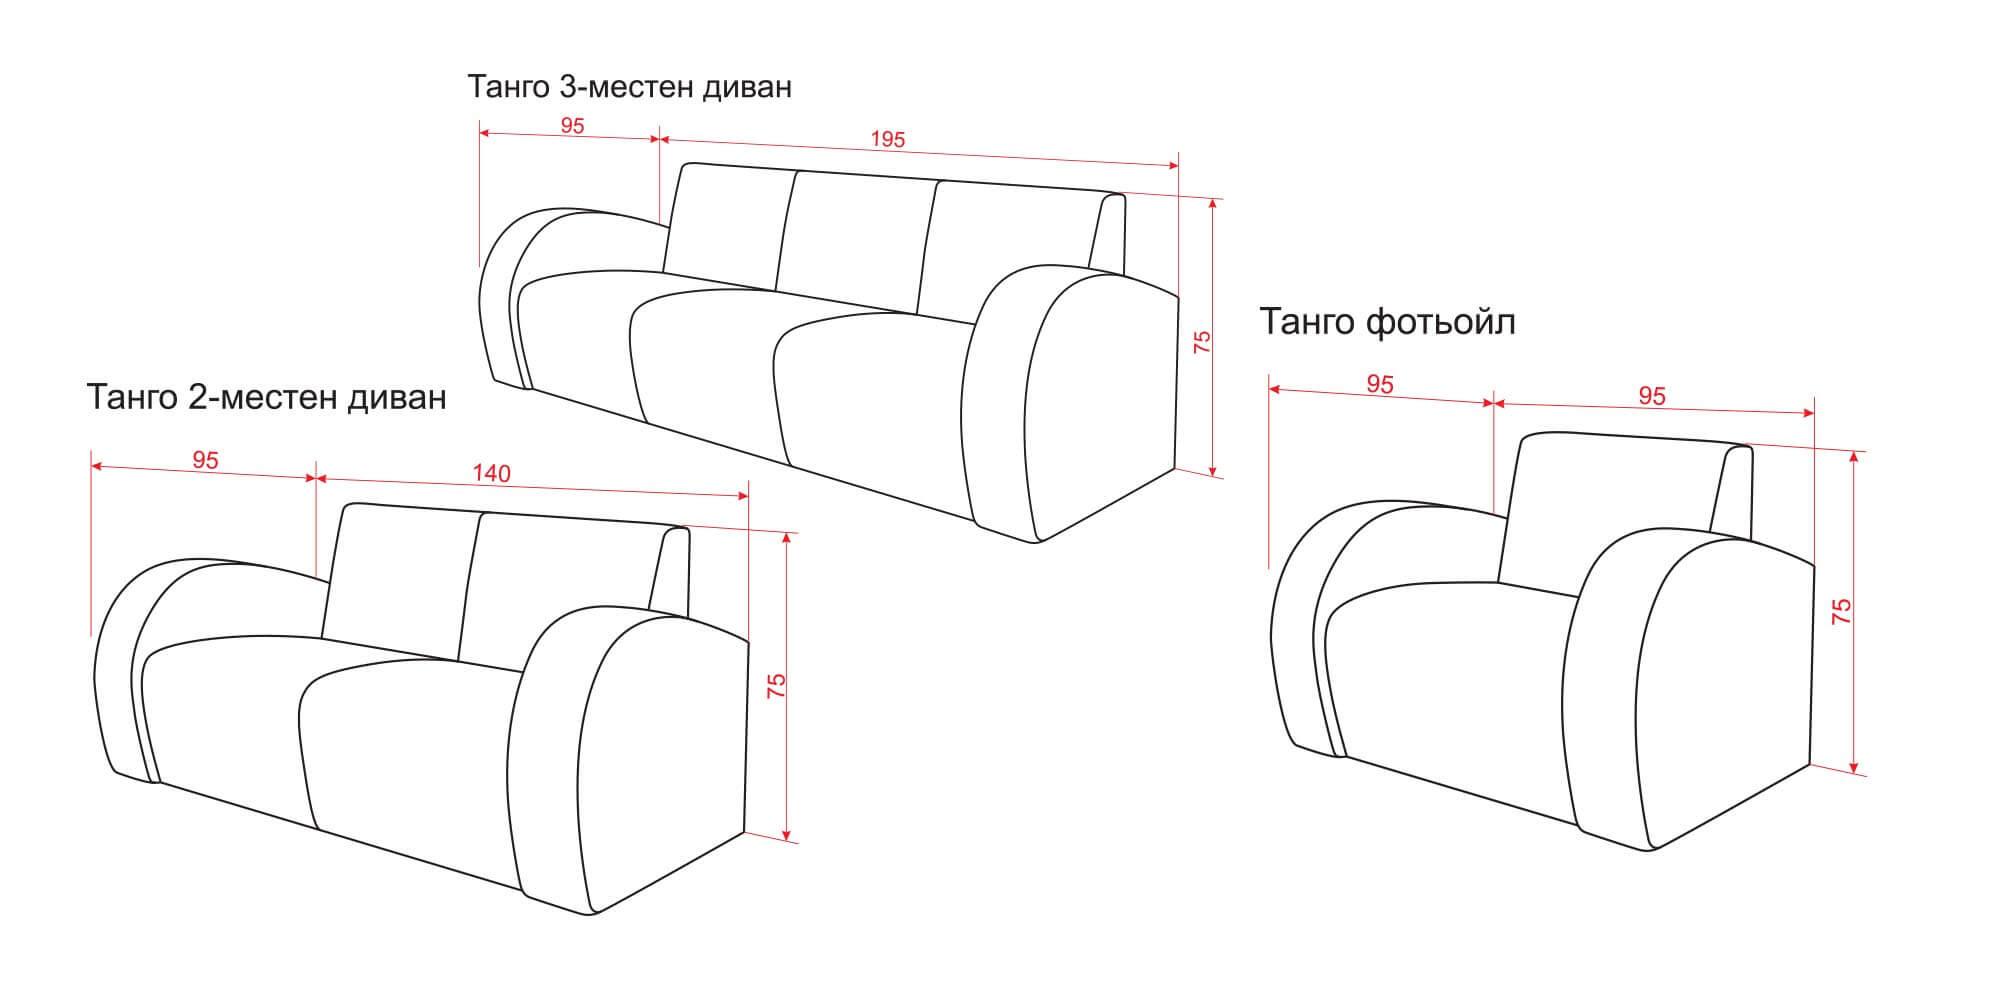 Схеми с размери Танго